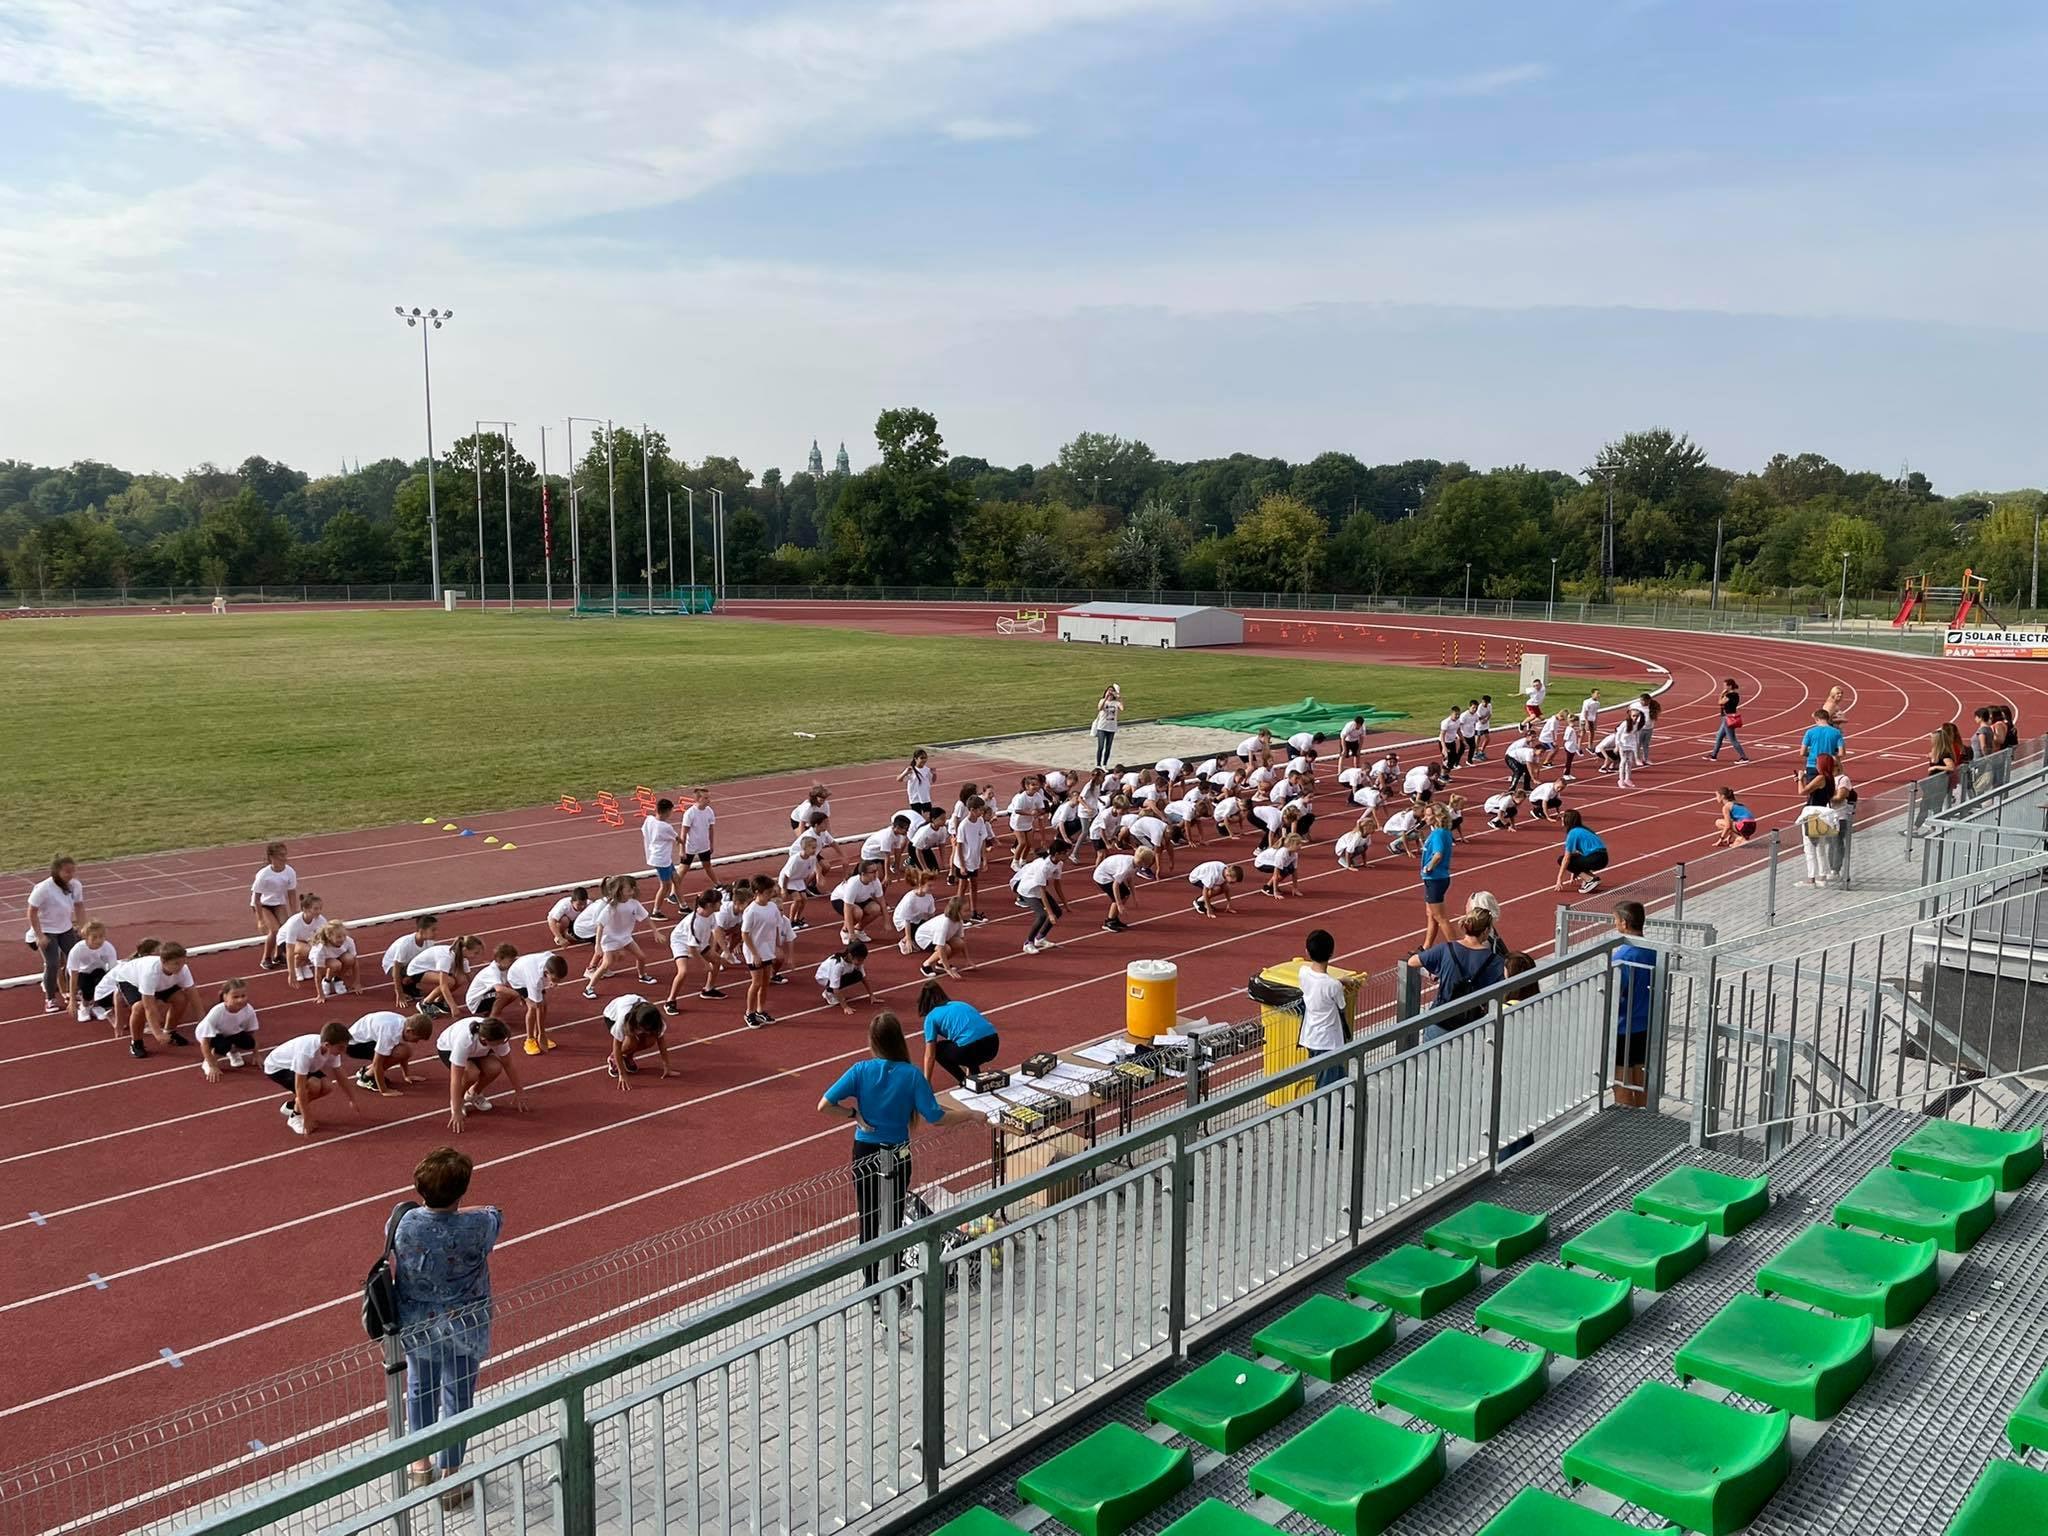 Pápai Atlétikai club - Pályaavató programsorozat -Atlétikai Centrum Pápa